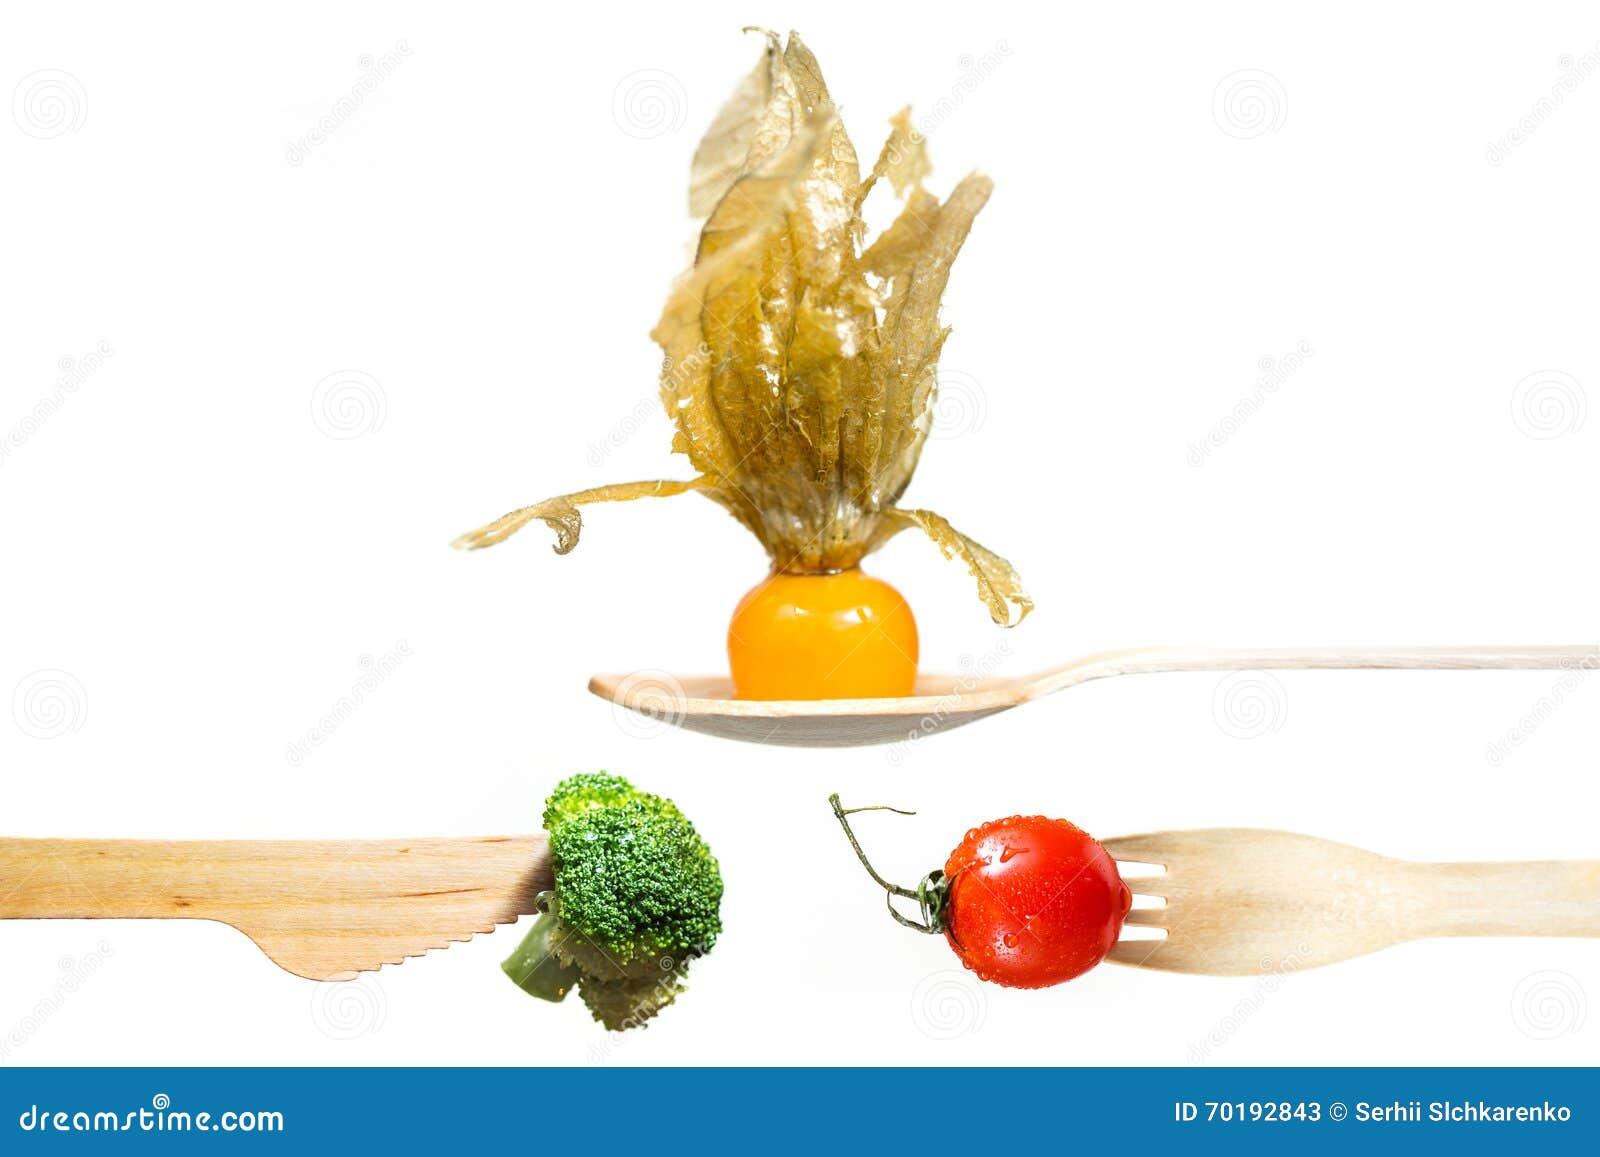 Nya grönsaker tomat, broccoli, physalis på trägaffeln, kniv, sked